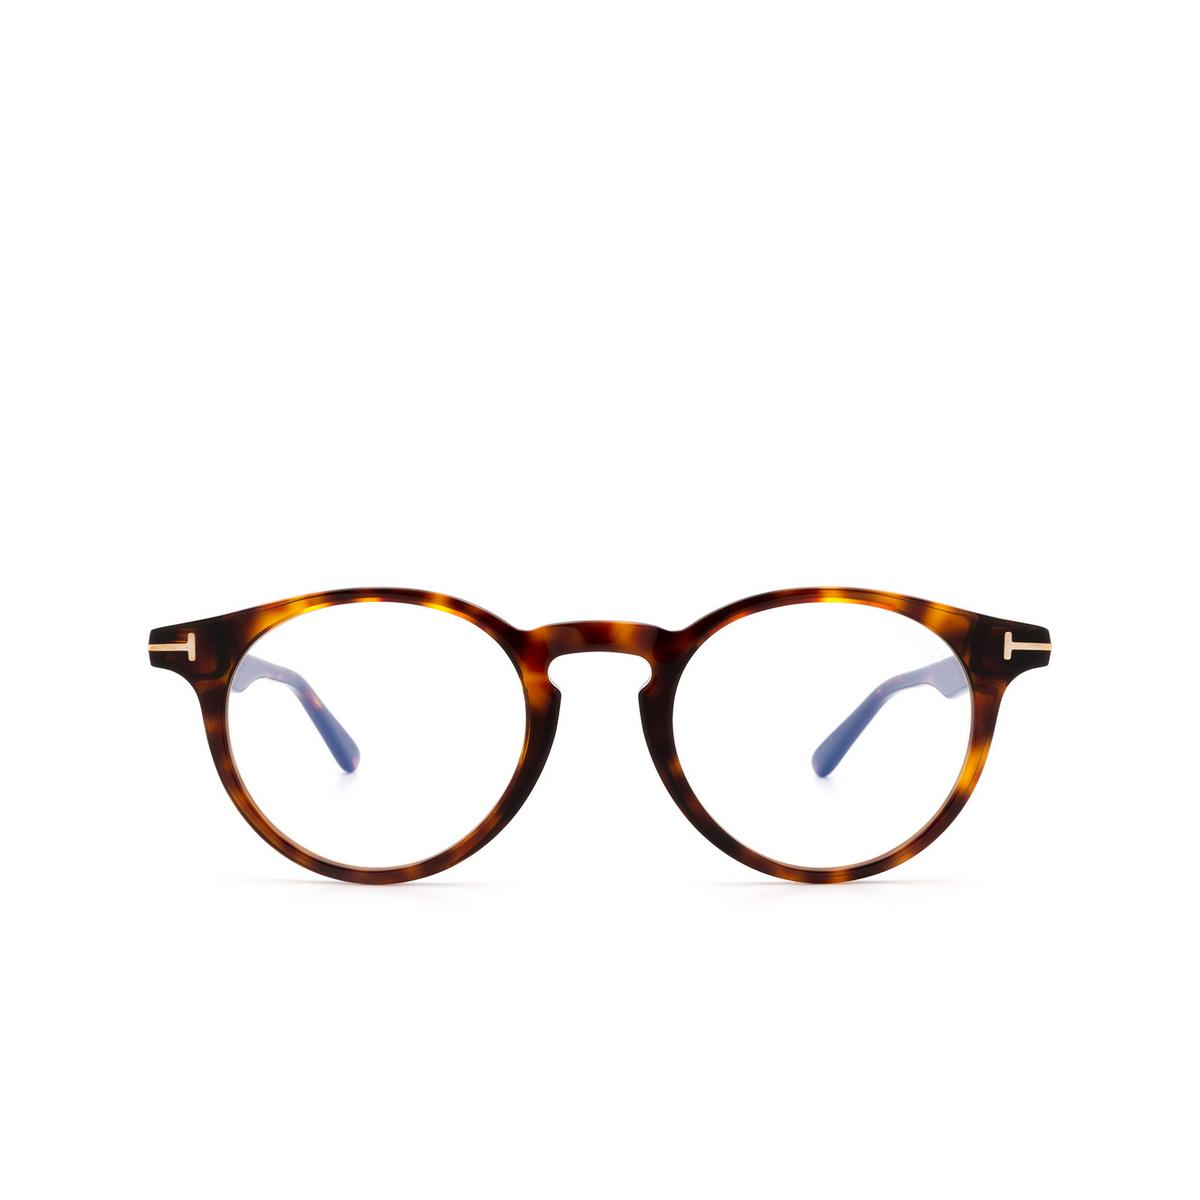 Tom Ford® Round Eyeglasses: FT5557-B color Dark Havana 052 - front view.